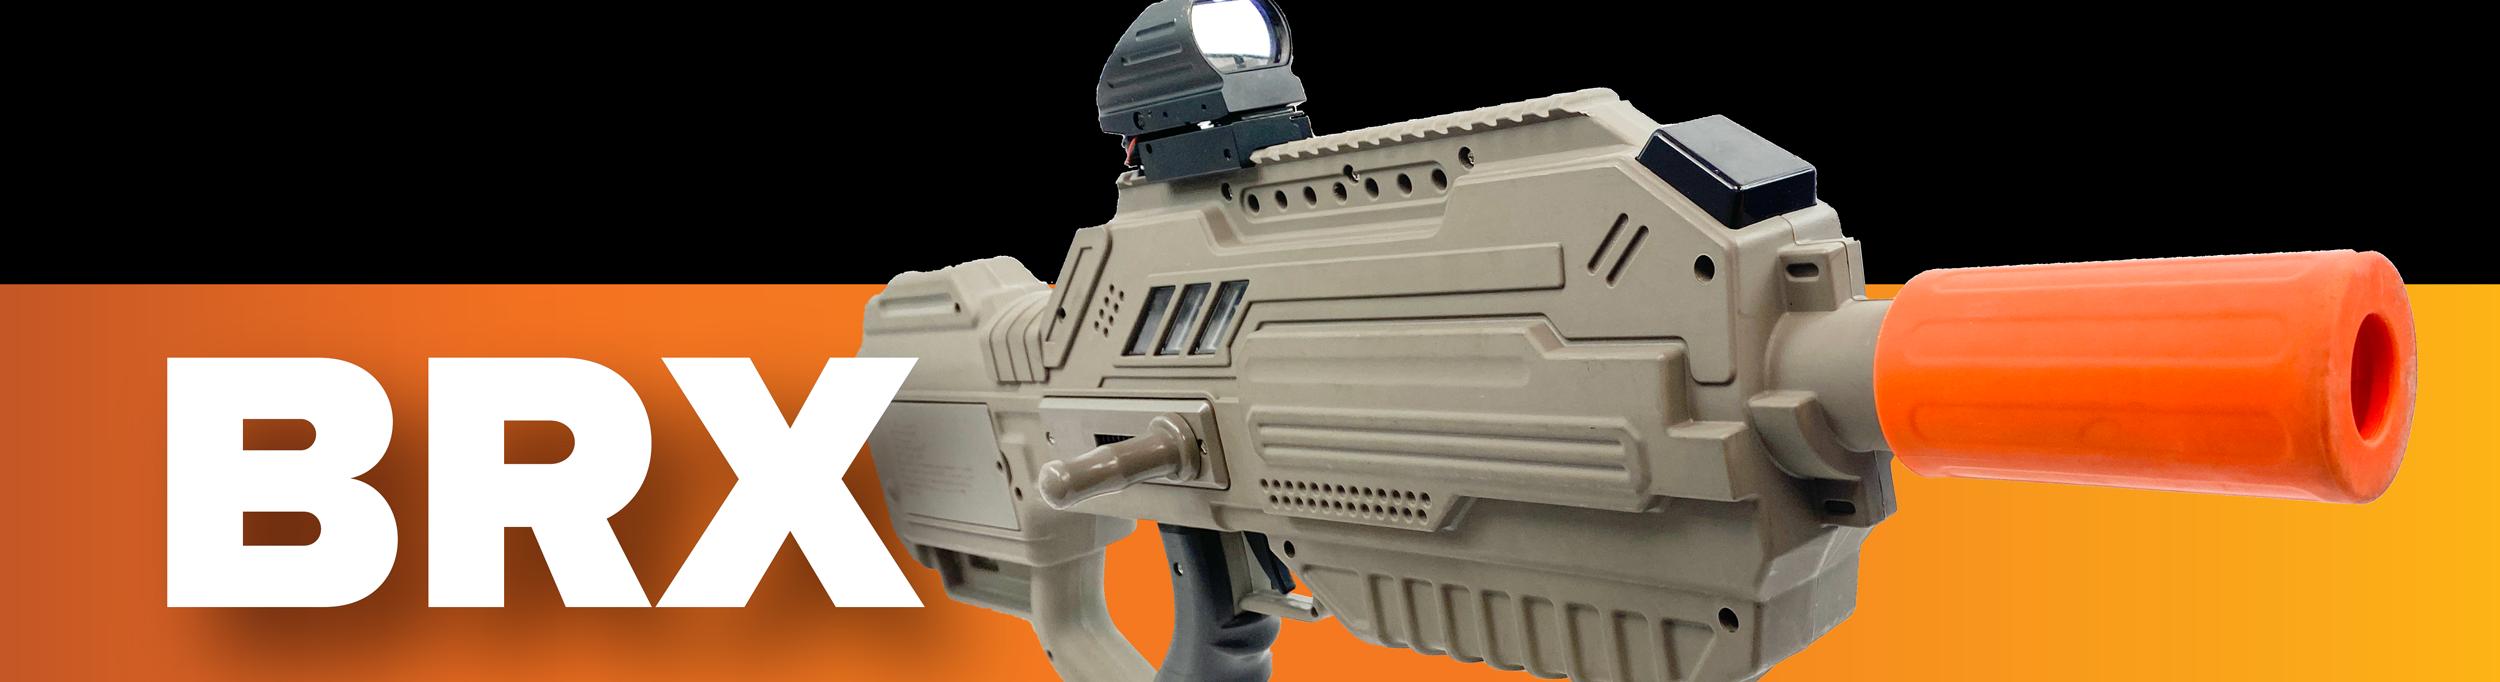 brx laser tag gun